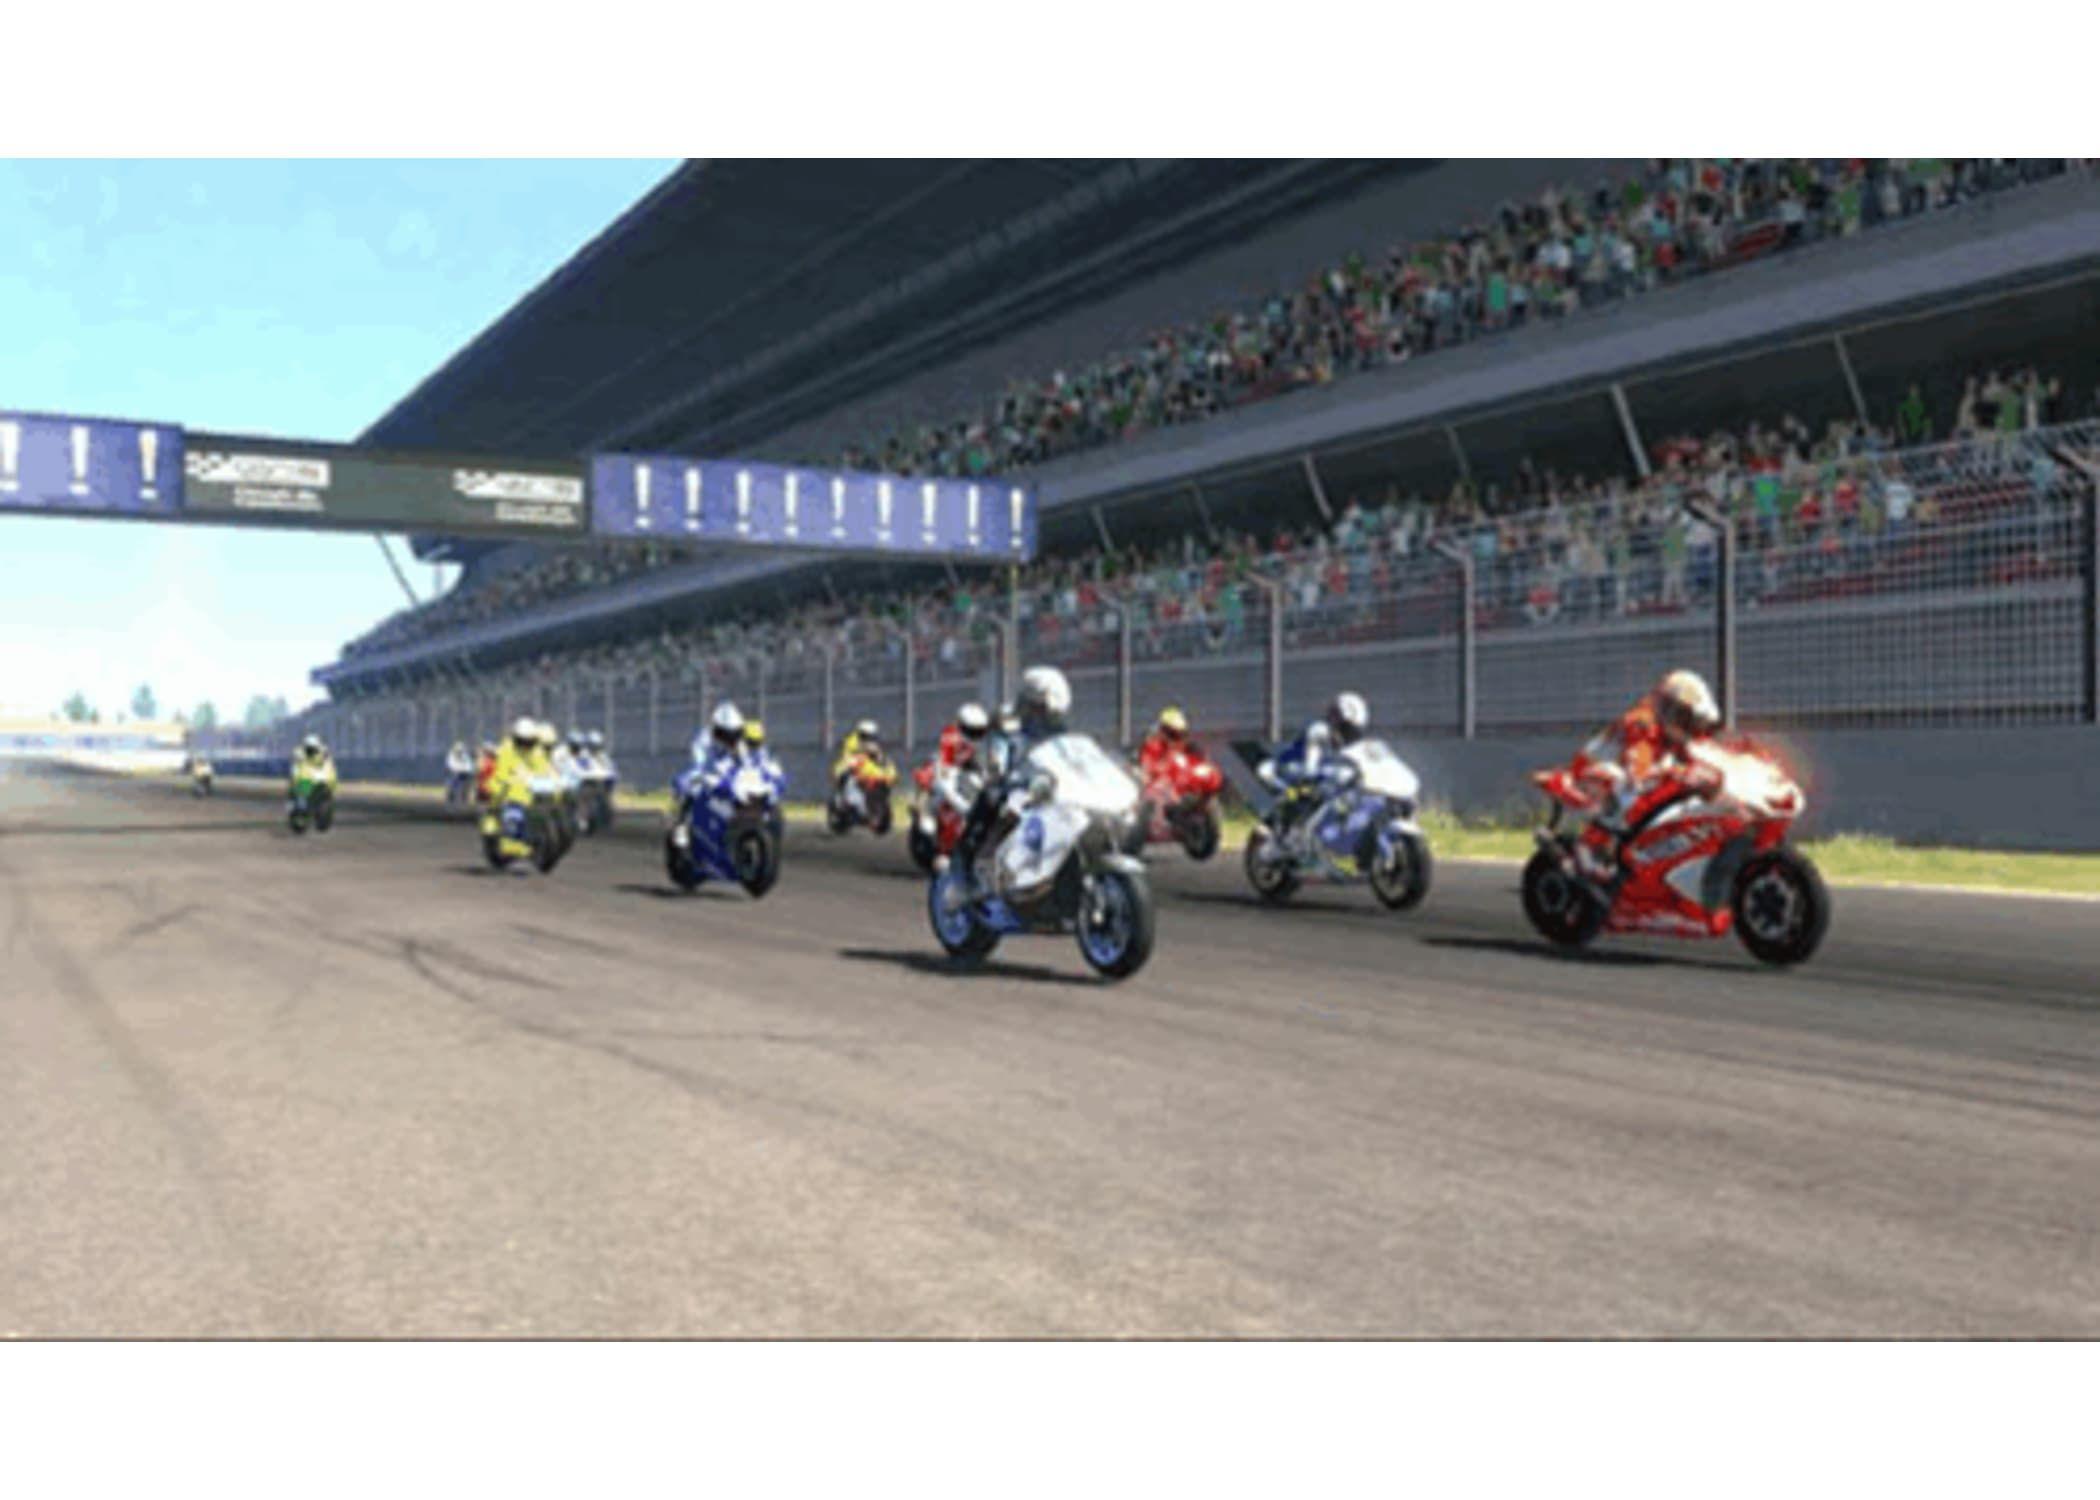 Buy Motogp 06 On Xbox 360 Game Affiliate Sponsored Motogp Buy Game Xbox In 2020 Motogp Street Motorcycles Intense Games